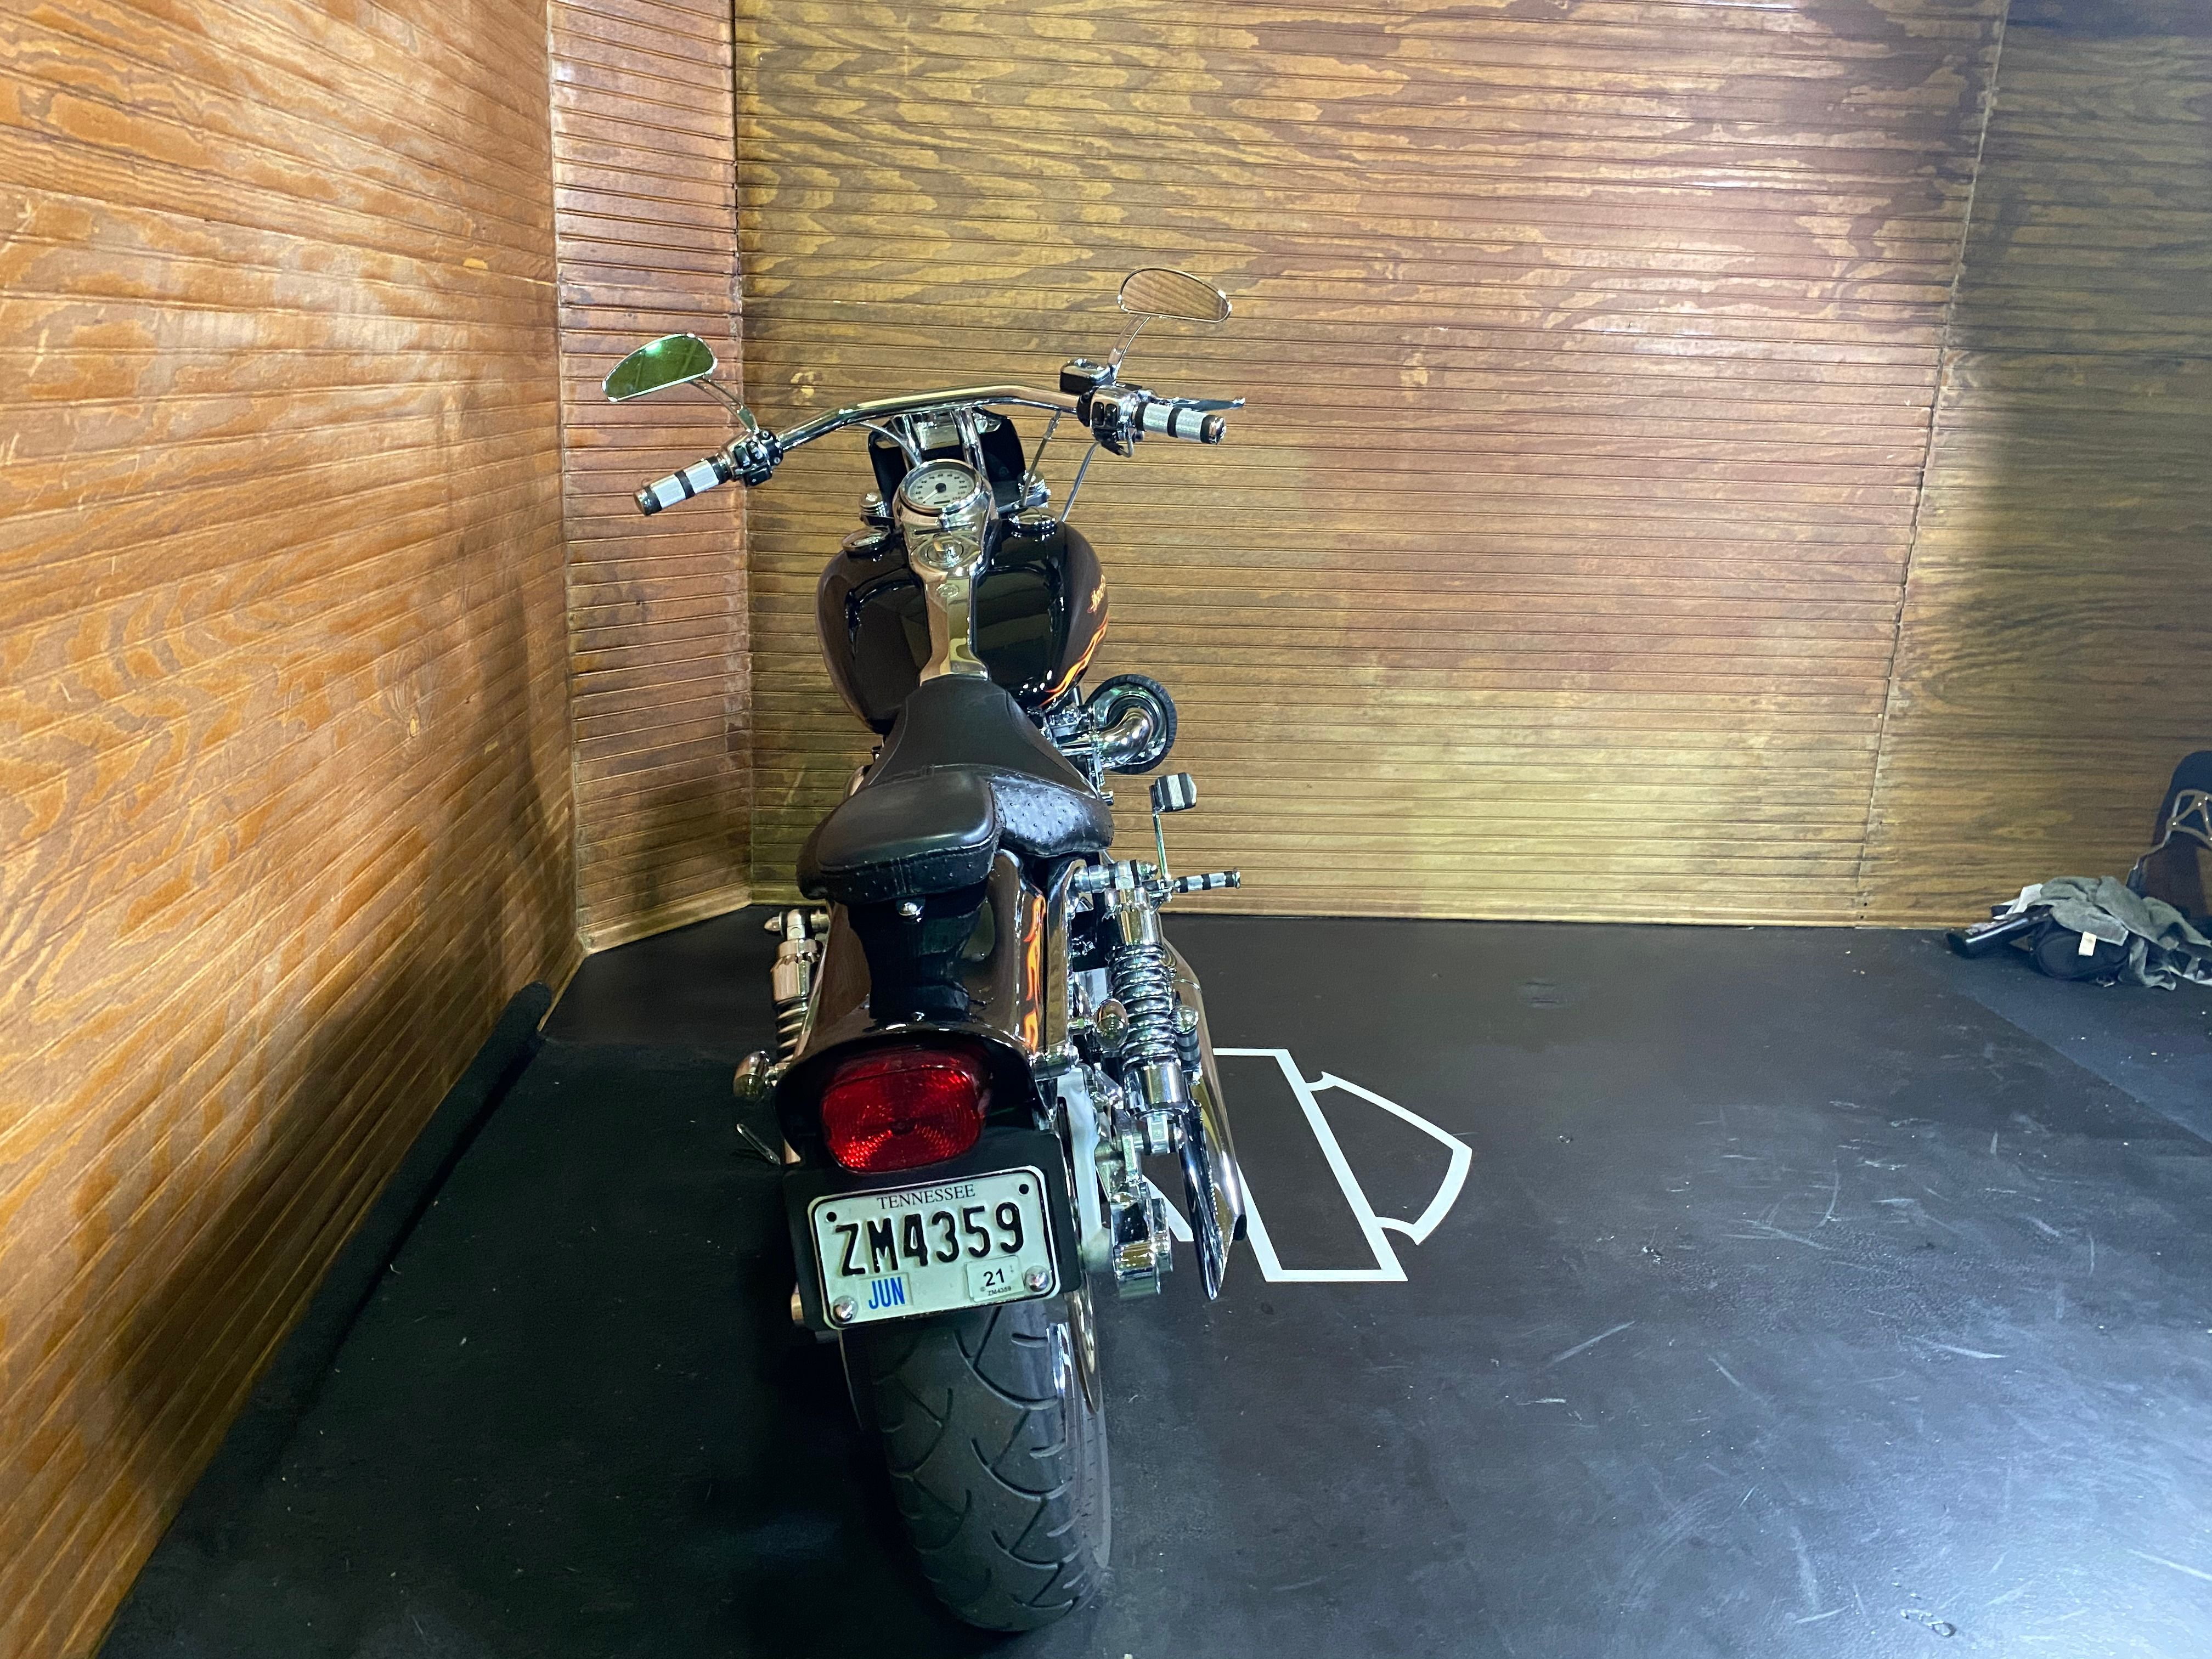 Pre-Owned 2002 Harley-Davidson Wide Glide